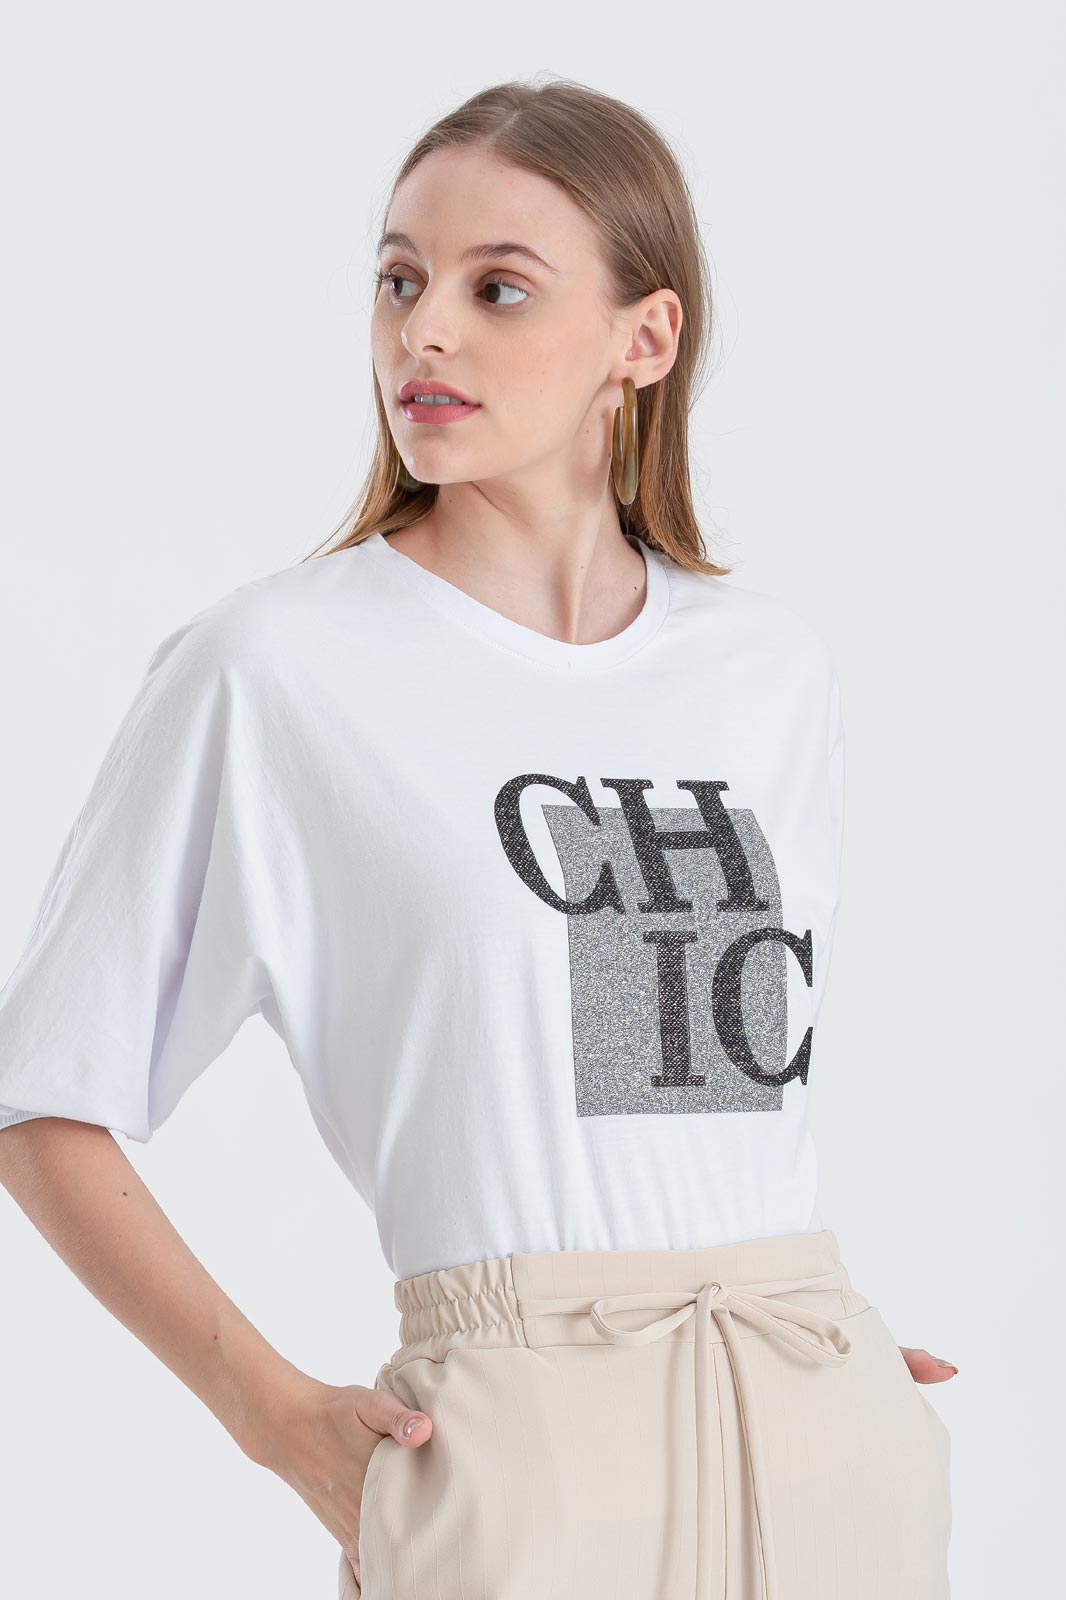 Blusa branca com estampa CHIC manga curta  Ref. 02658